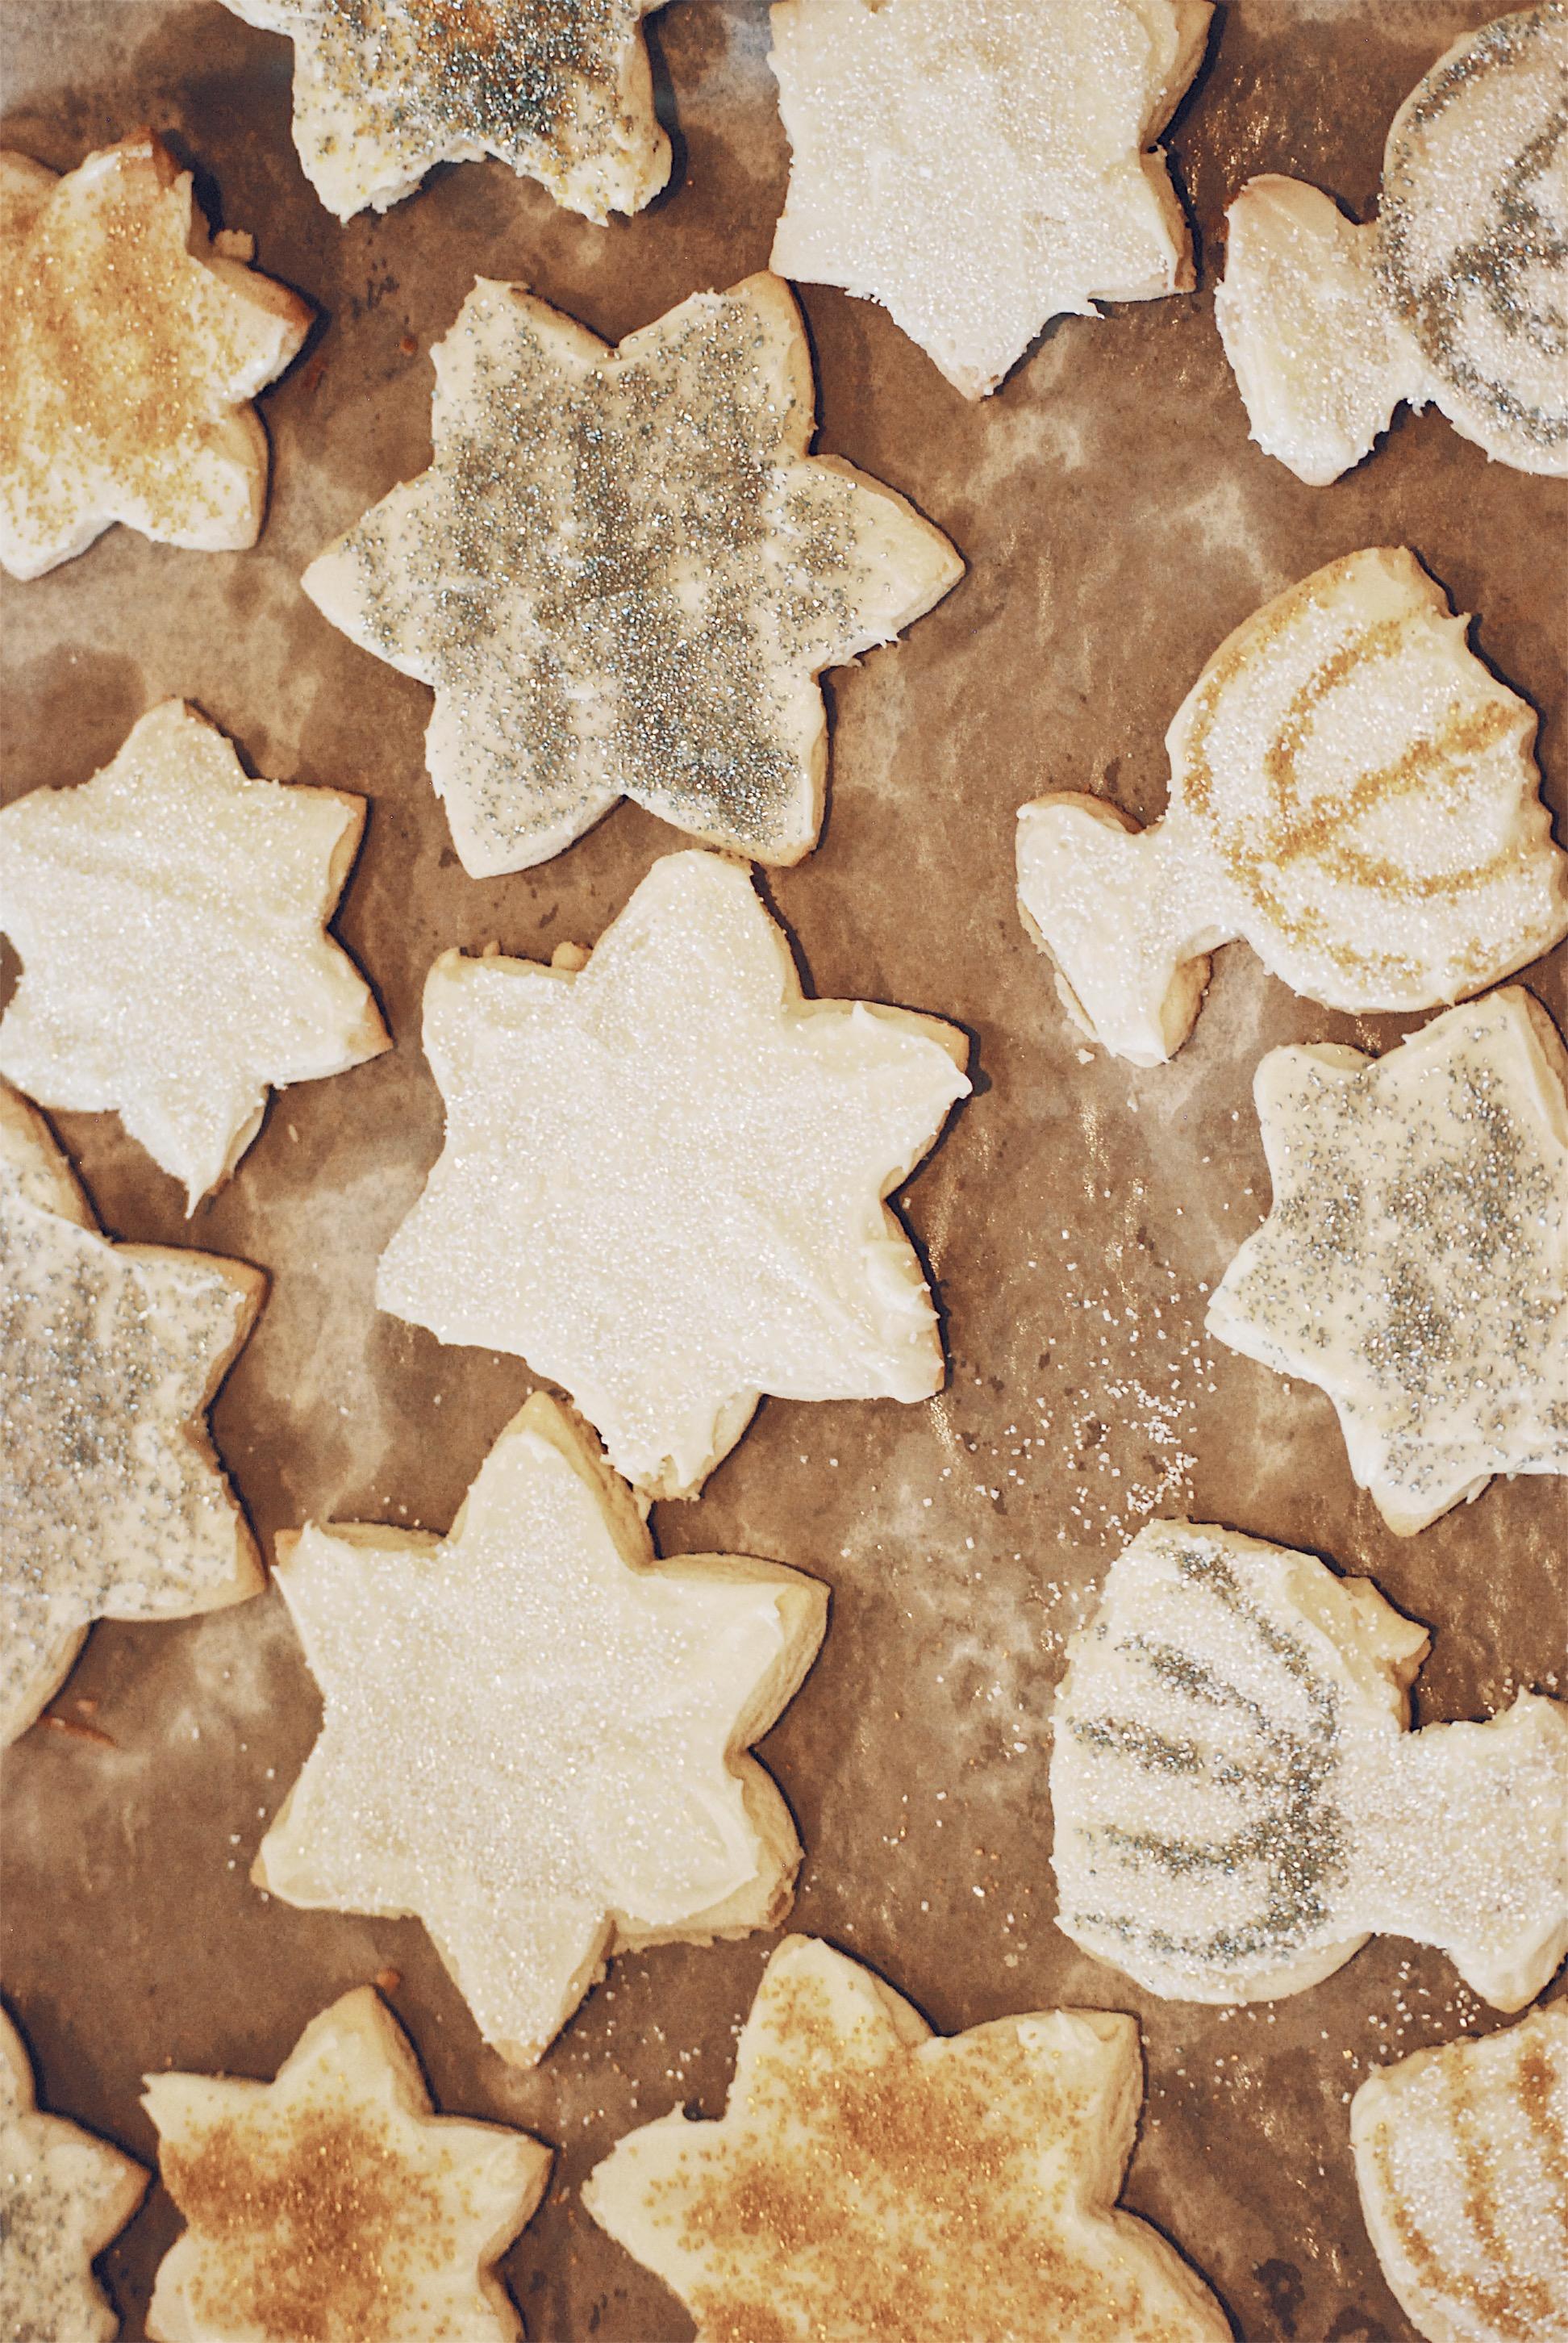 Three Joyful Reasons to Celebrate Hanukkah as a Christian